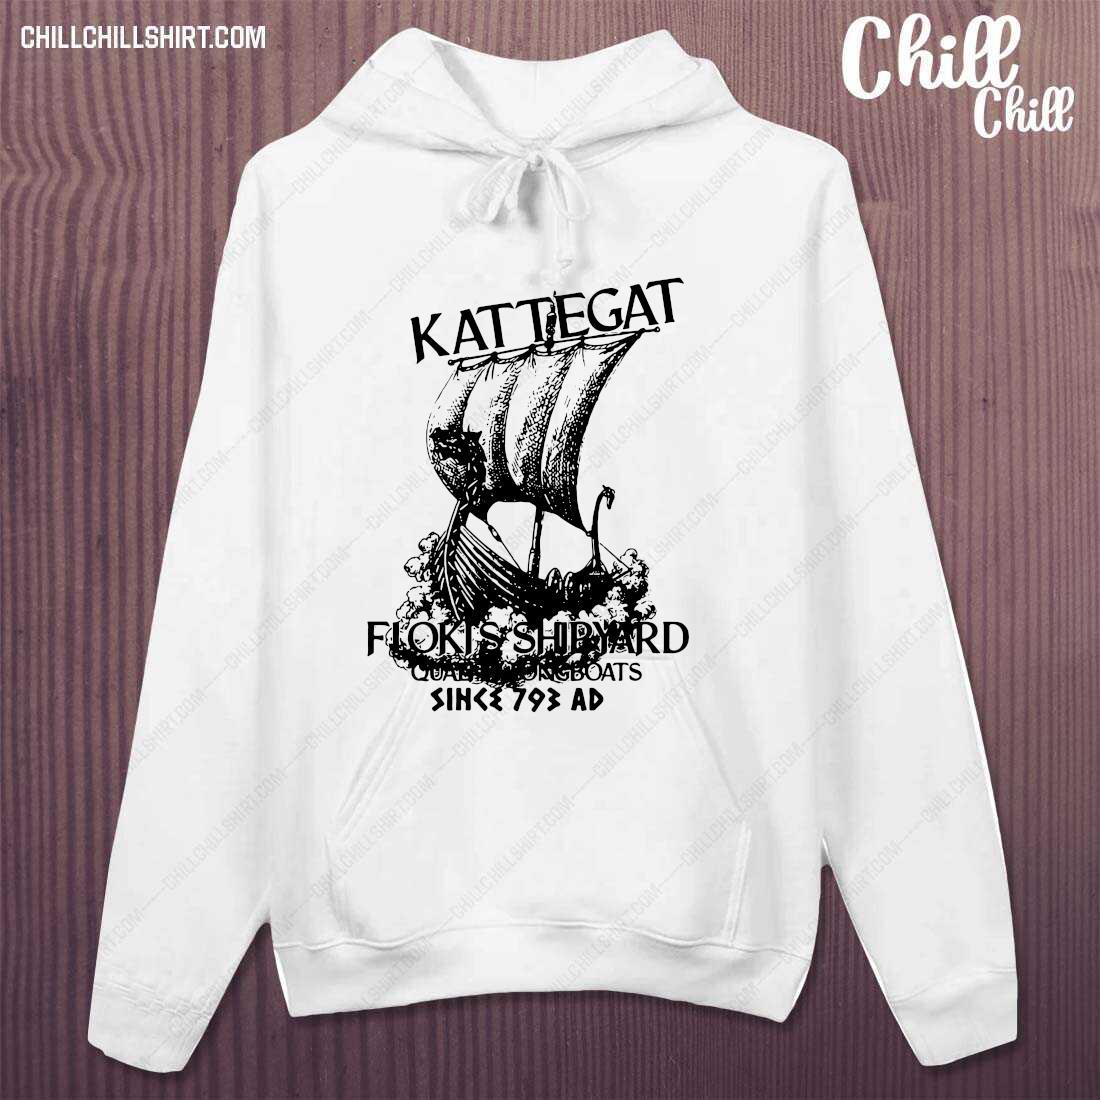 Kattegat Floki's Shipyard Quality Longboats Since 793 Ad Shirt hoodie